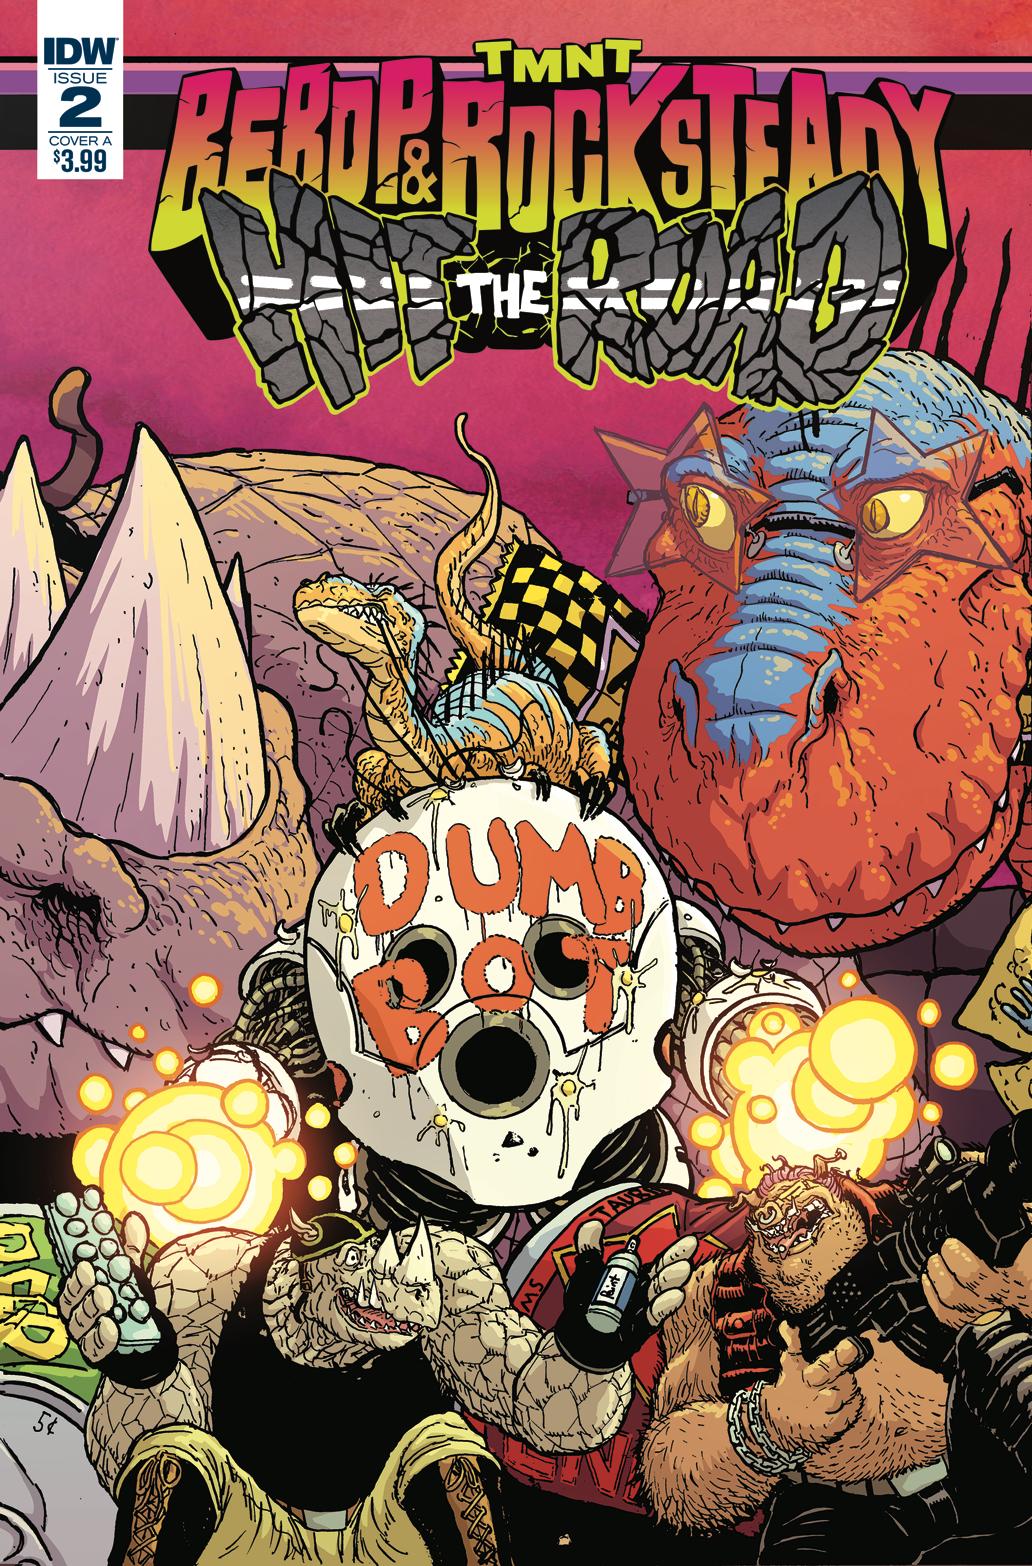 TMNT: Bebop & Rocksteady #2. IDW Publishing